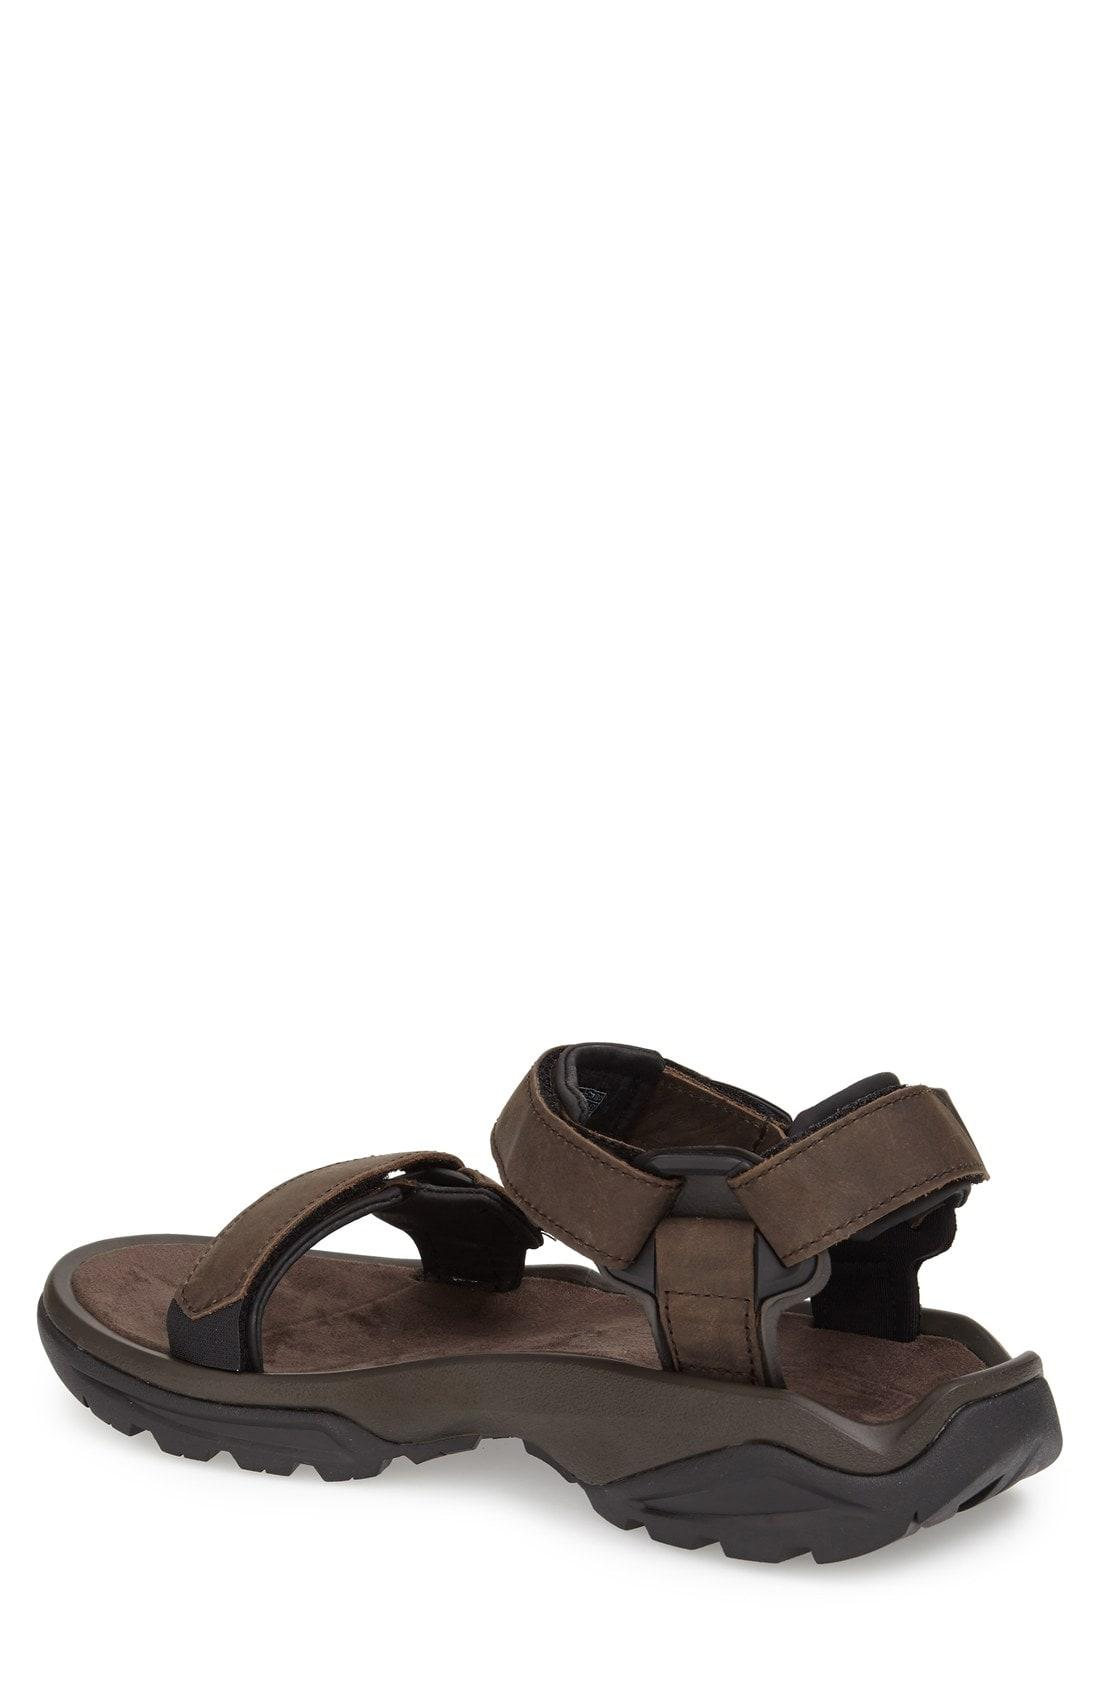 24f06bf64 Teva Men S Terra Fi 4 Water-Resistant Leather Sandals Men S Shoes In  Turkish Coffee